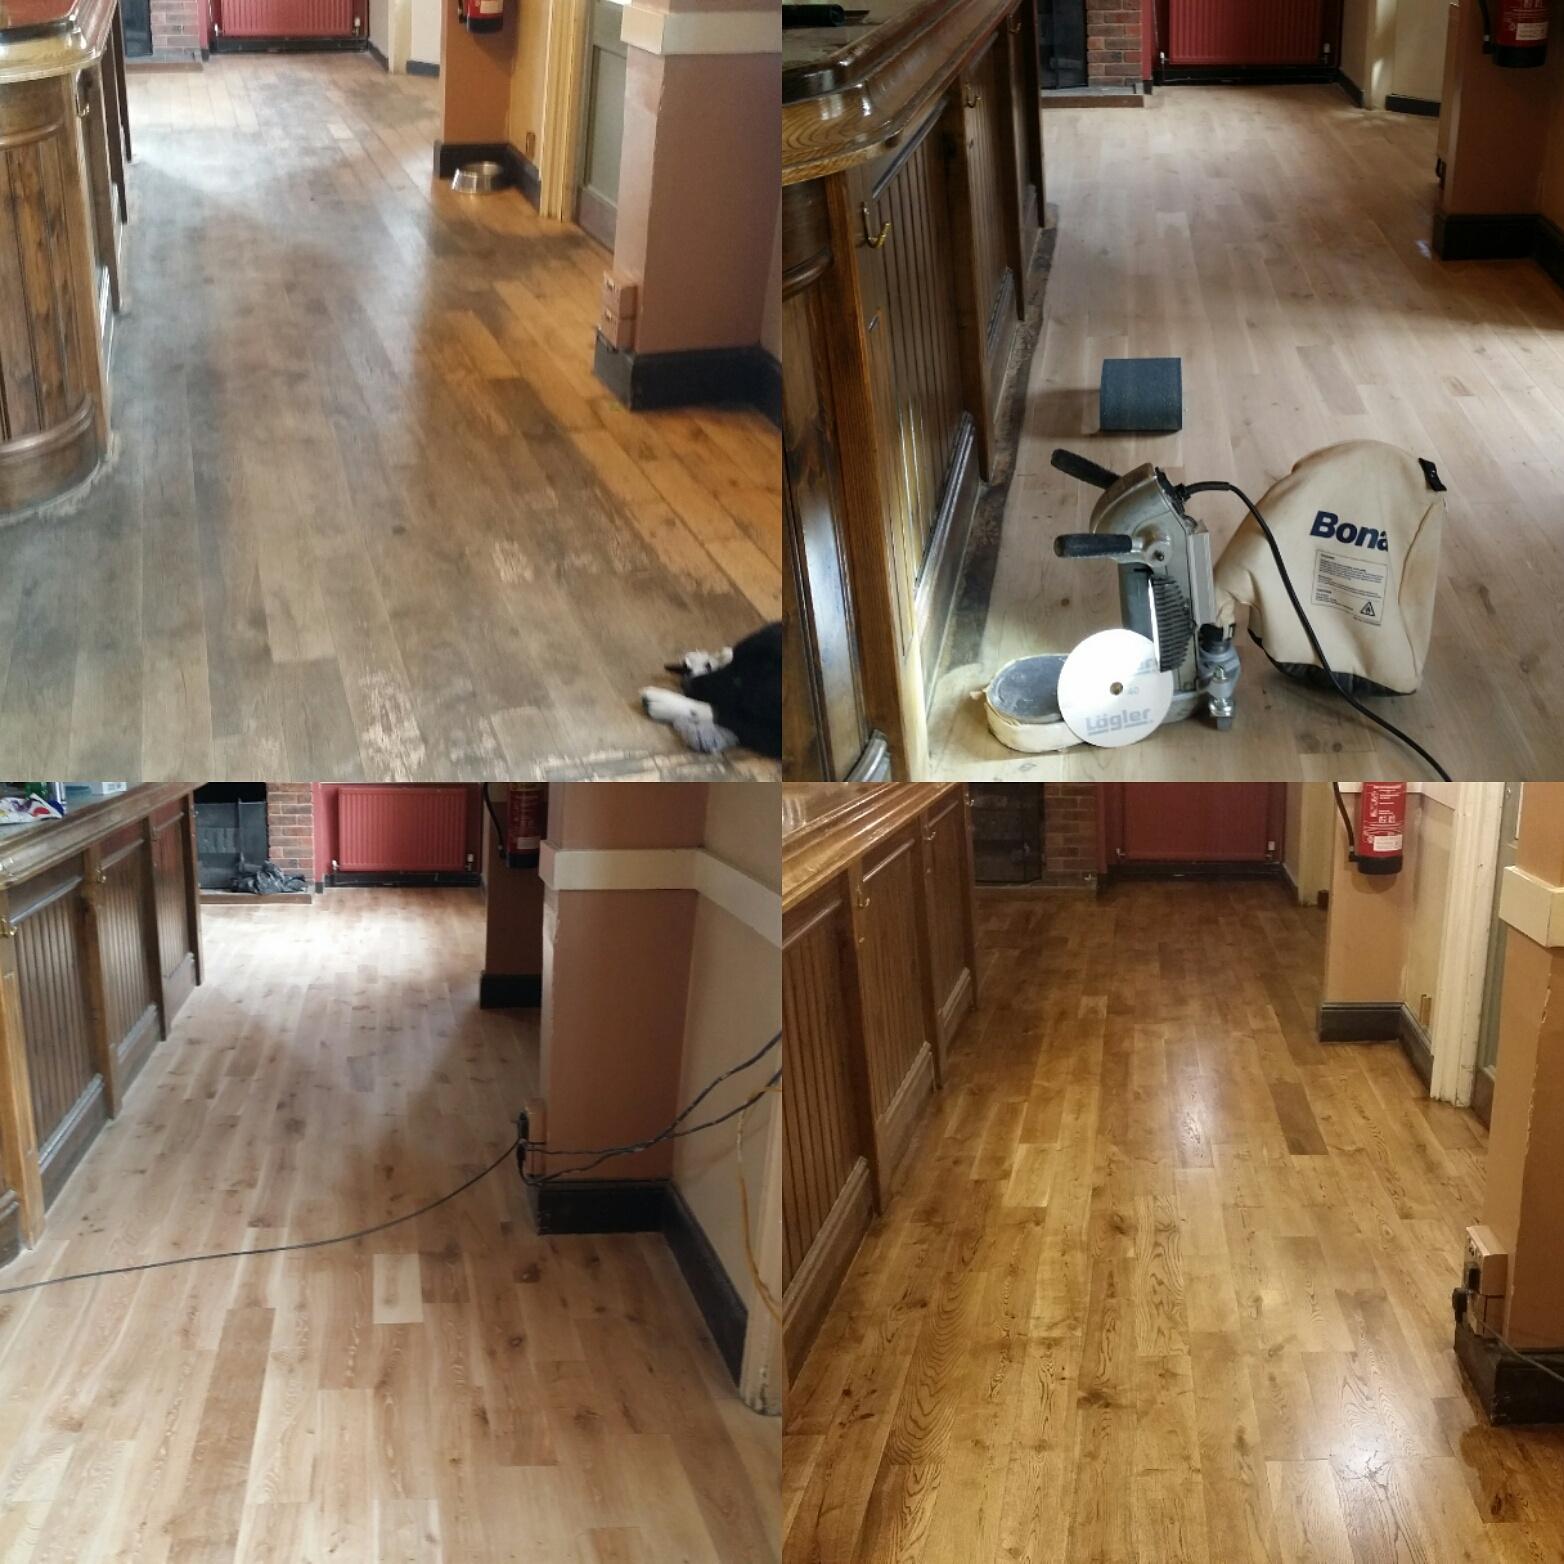 Commercial Floor sanding and refinishing